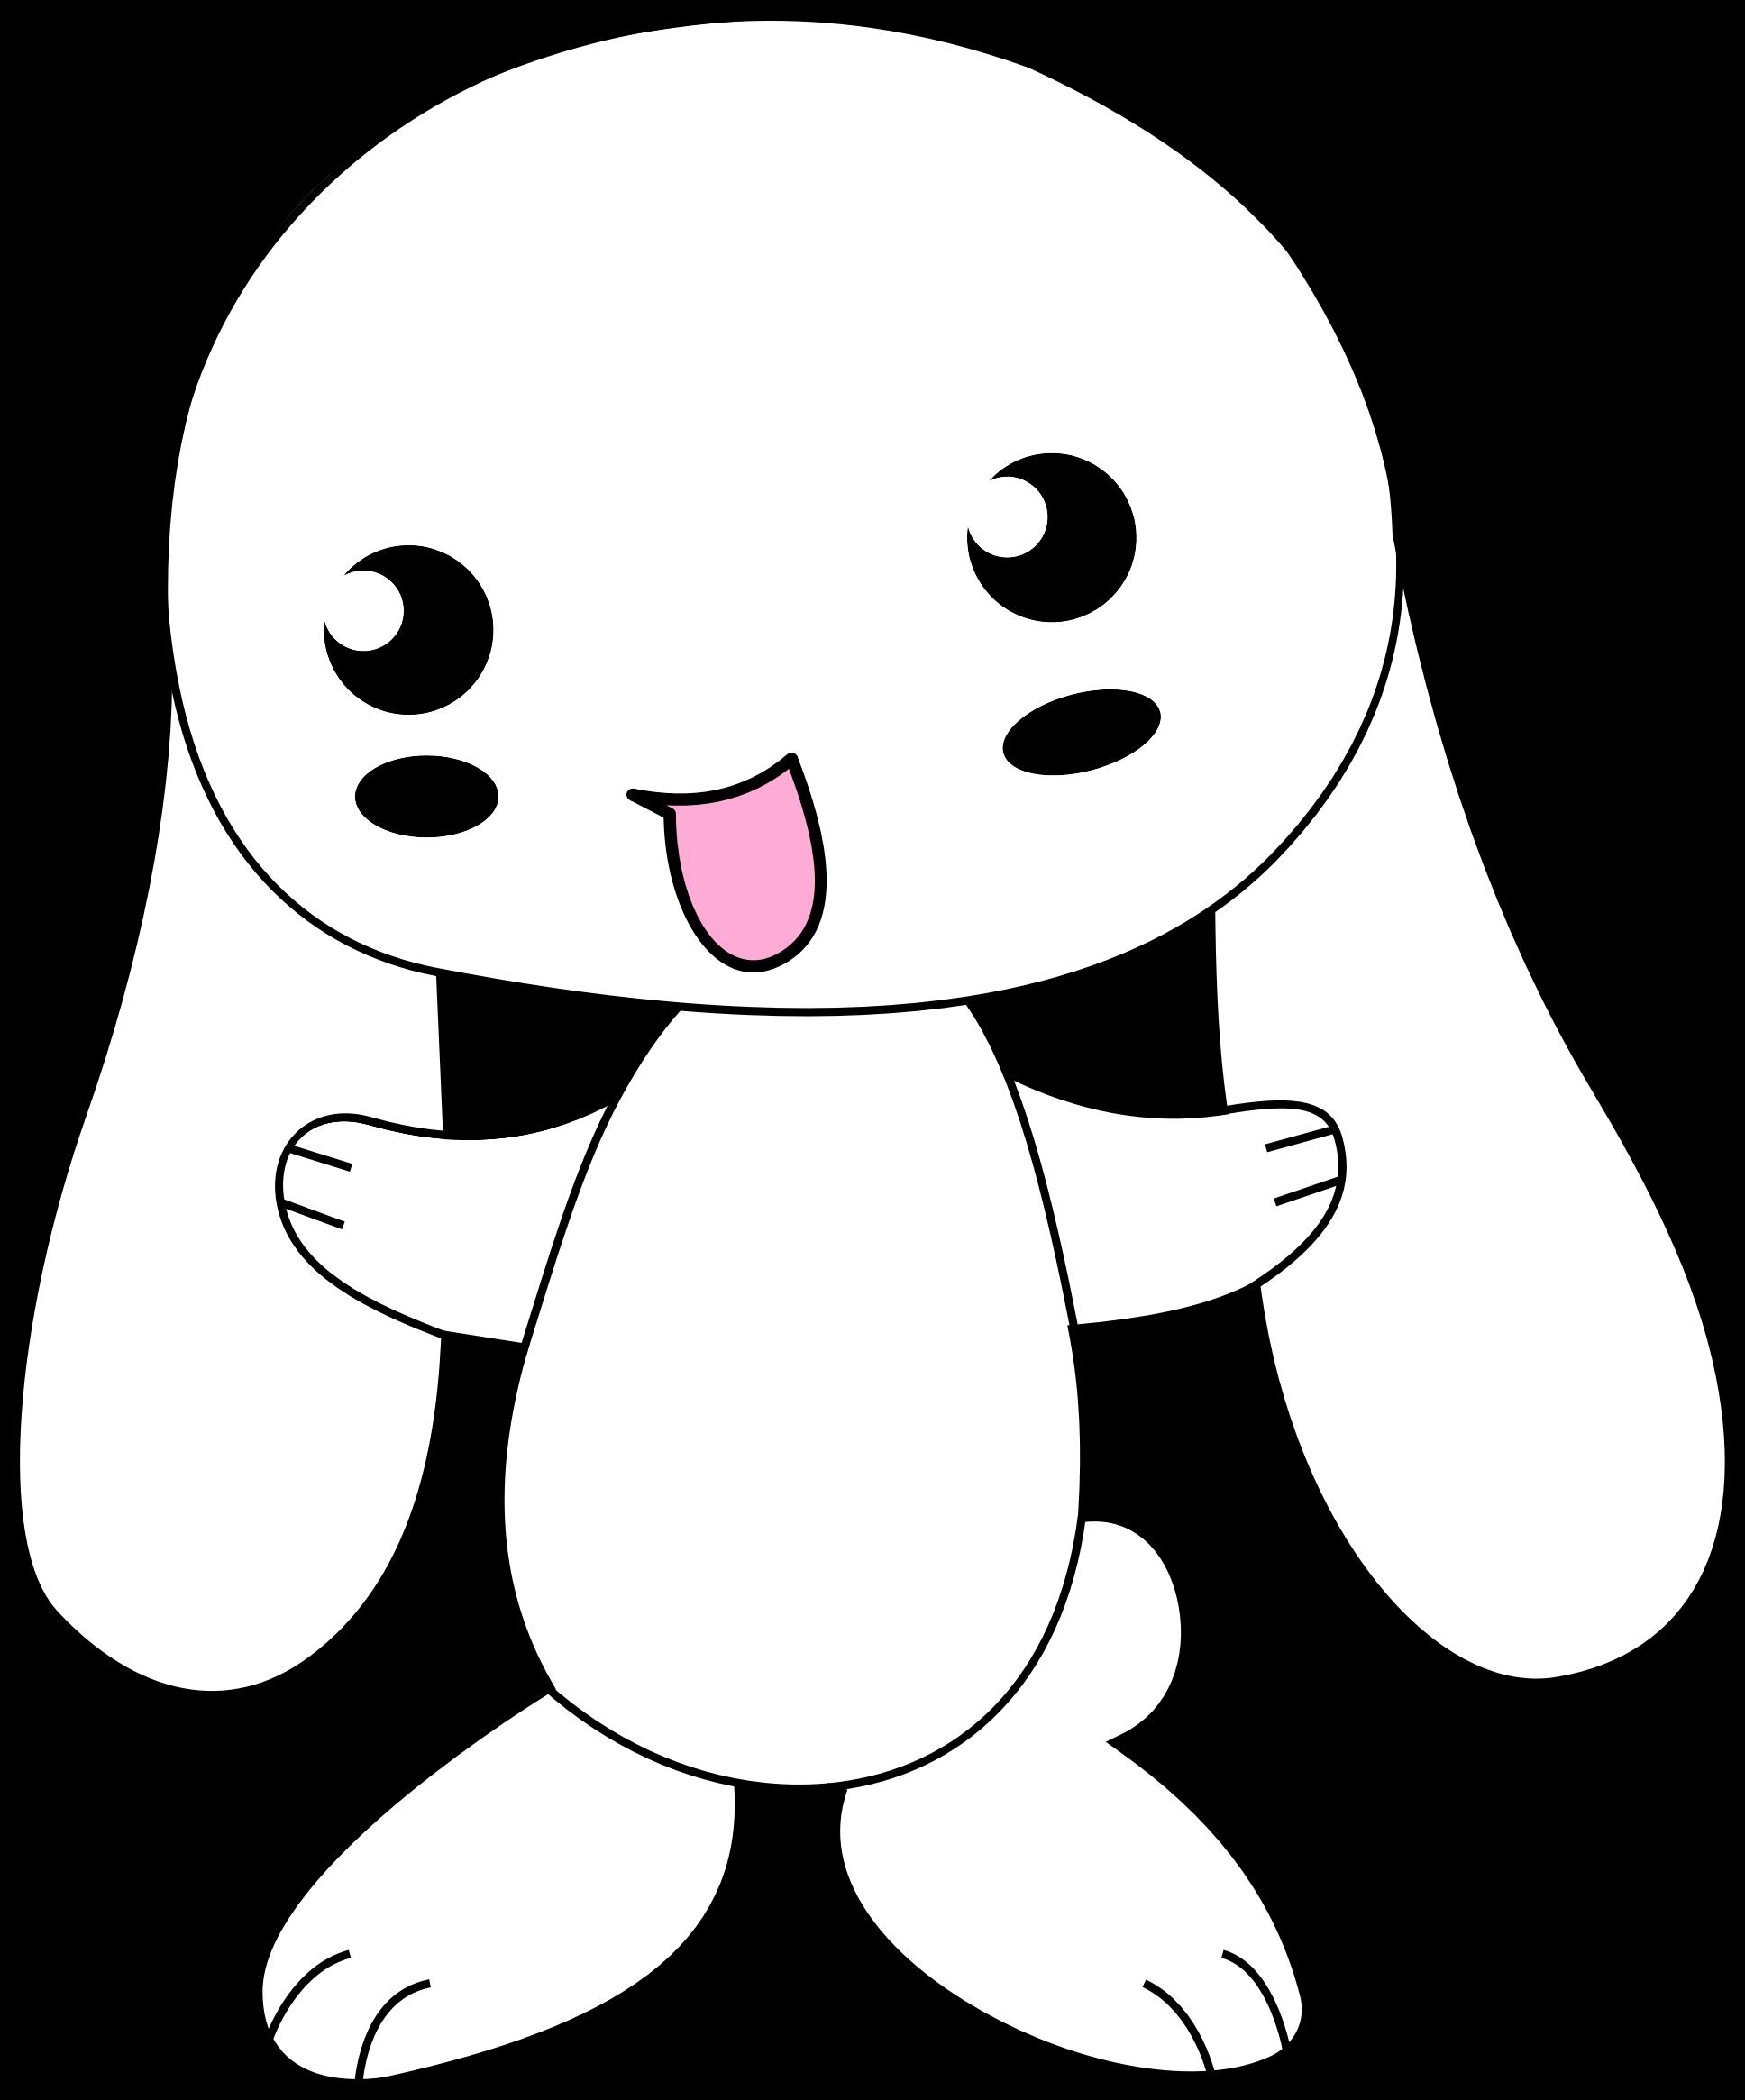 Clipart bunny head. Cute cartoon big image